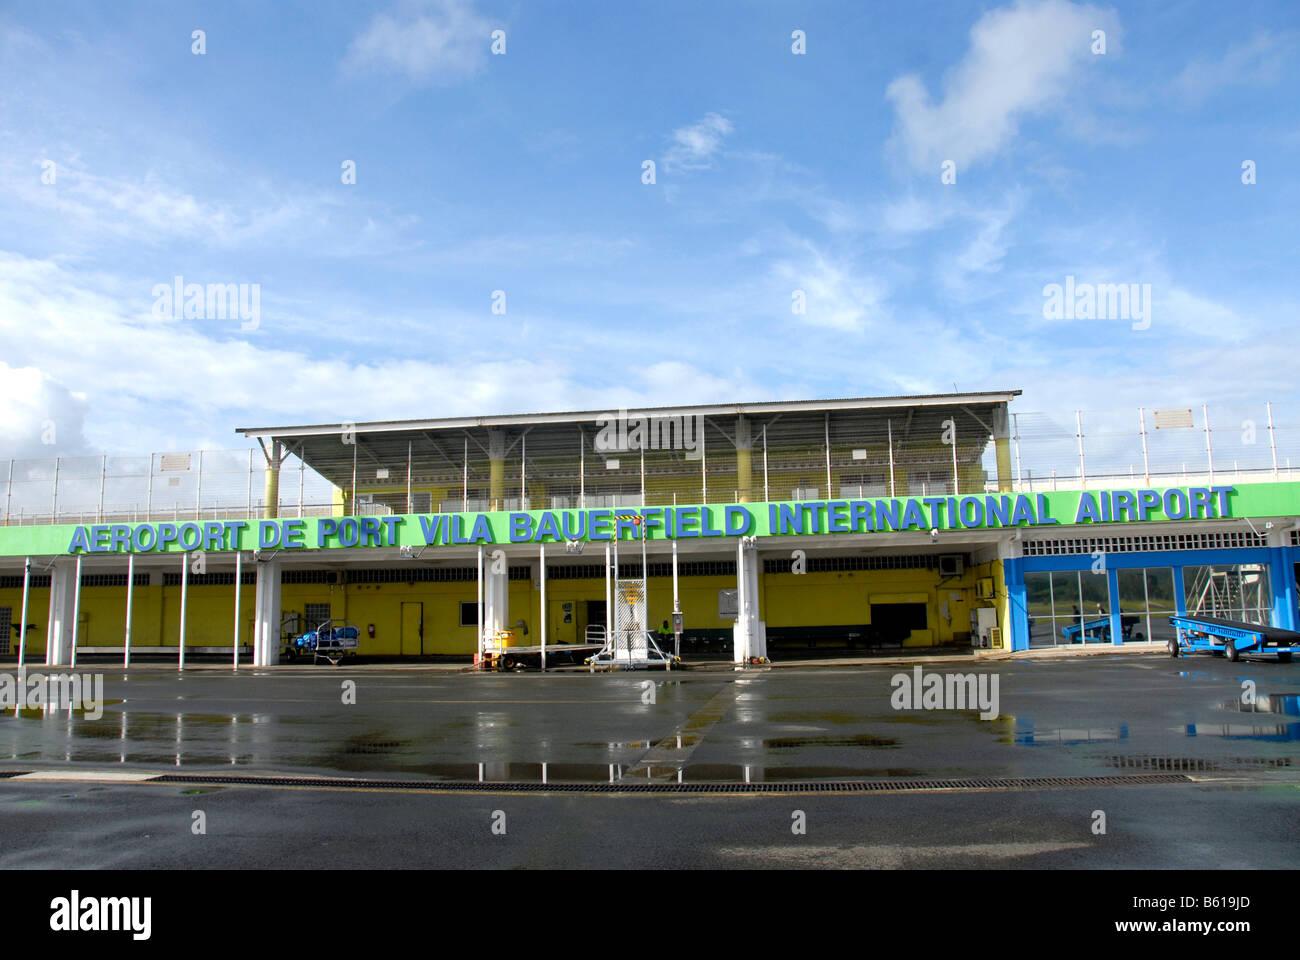 transportBauerfield international airport, Port Vila, Efate island, Vanuatu - Stock Image